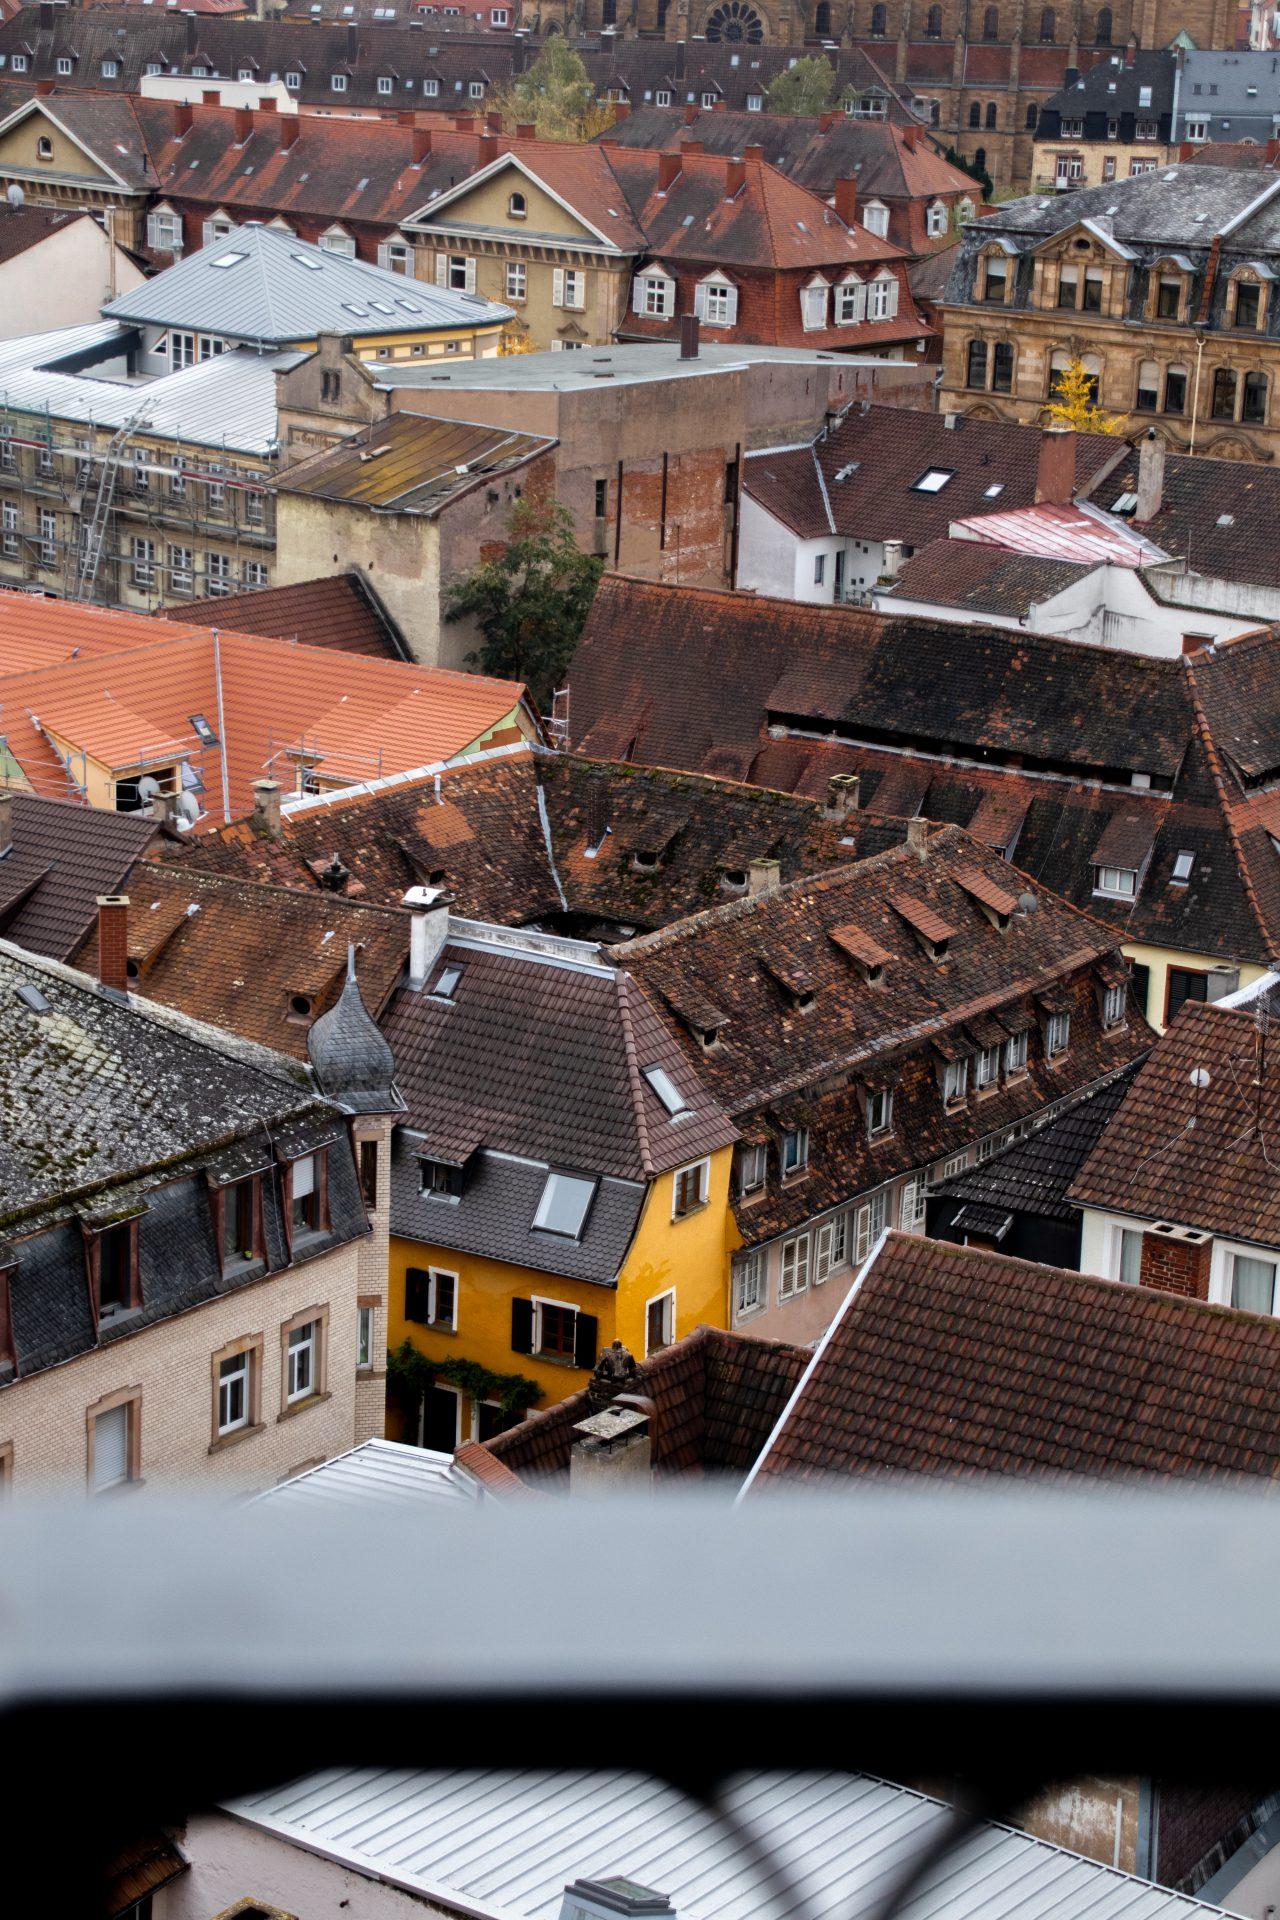 landau-stiftskirche-ausblick-haus